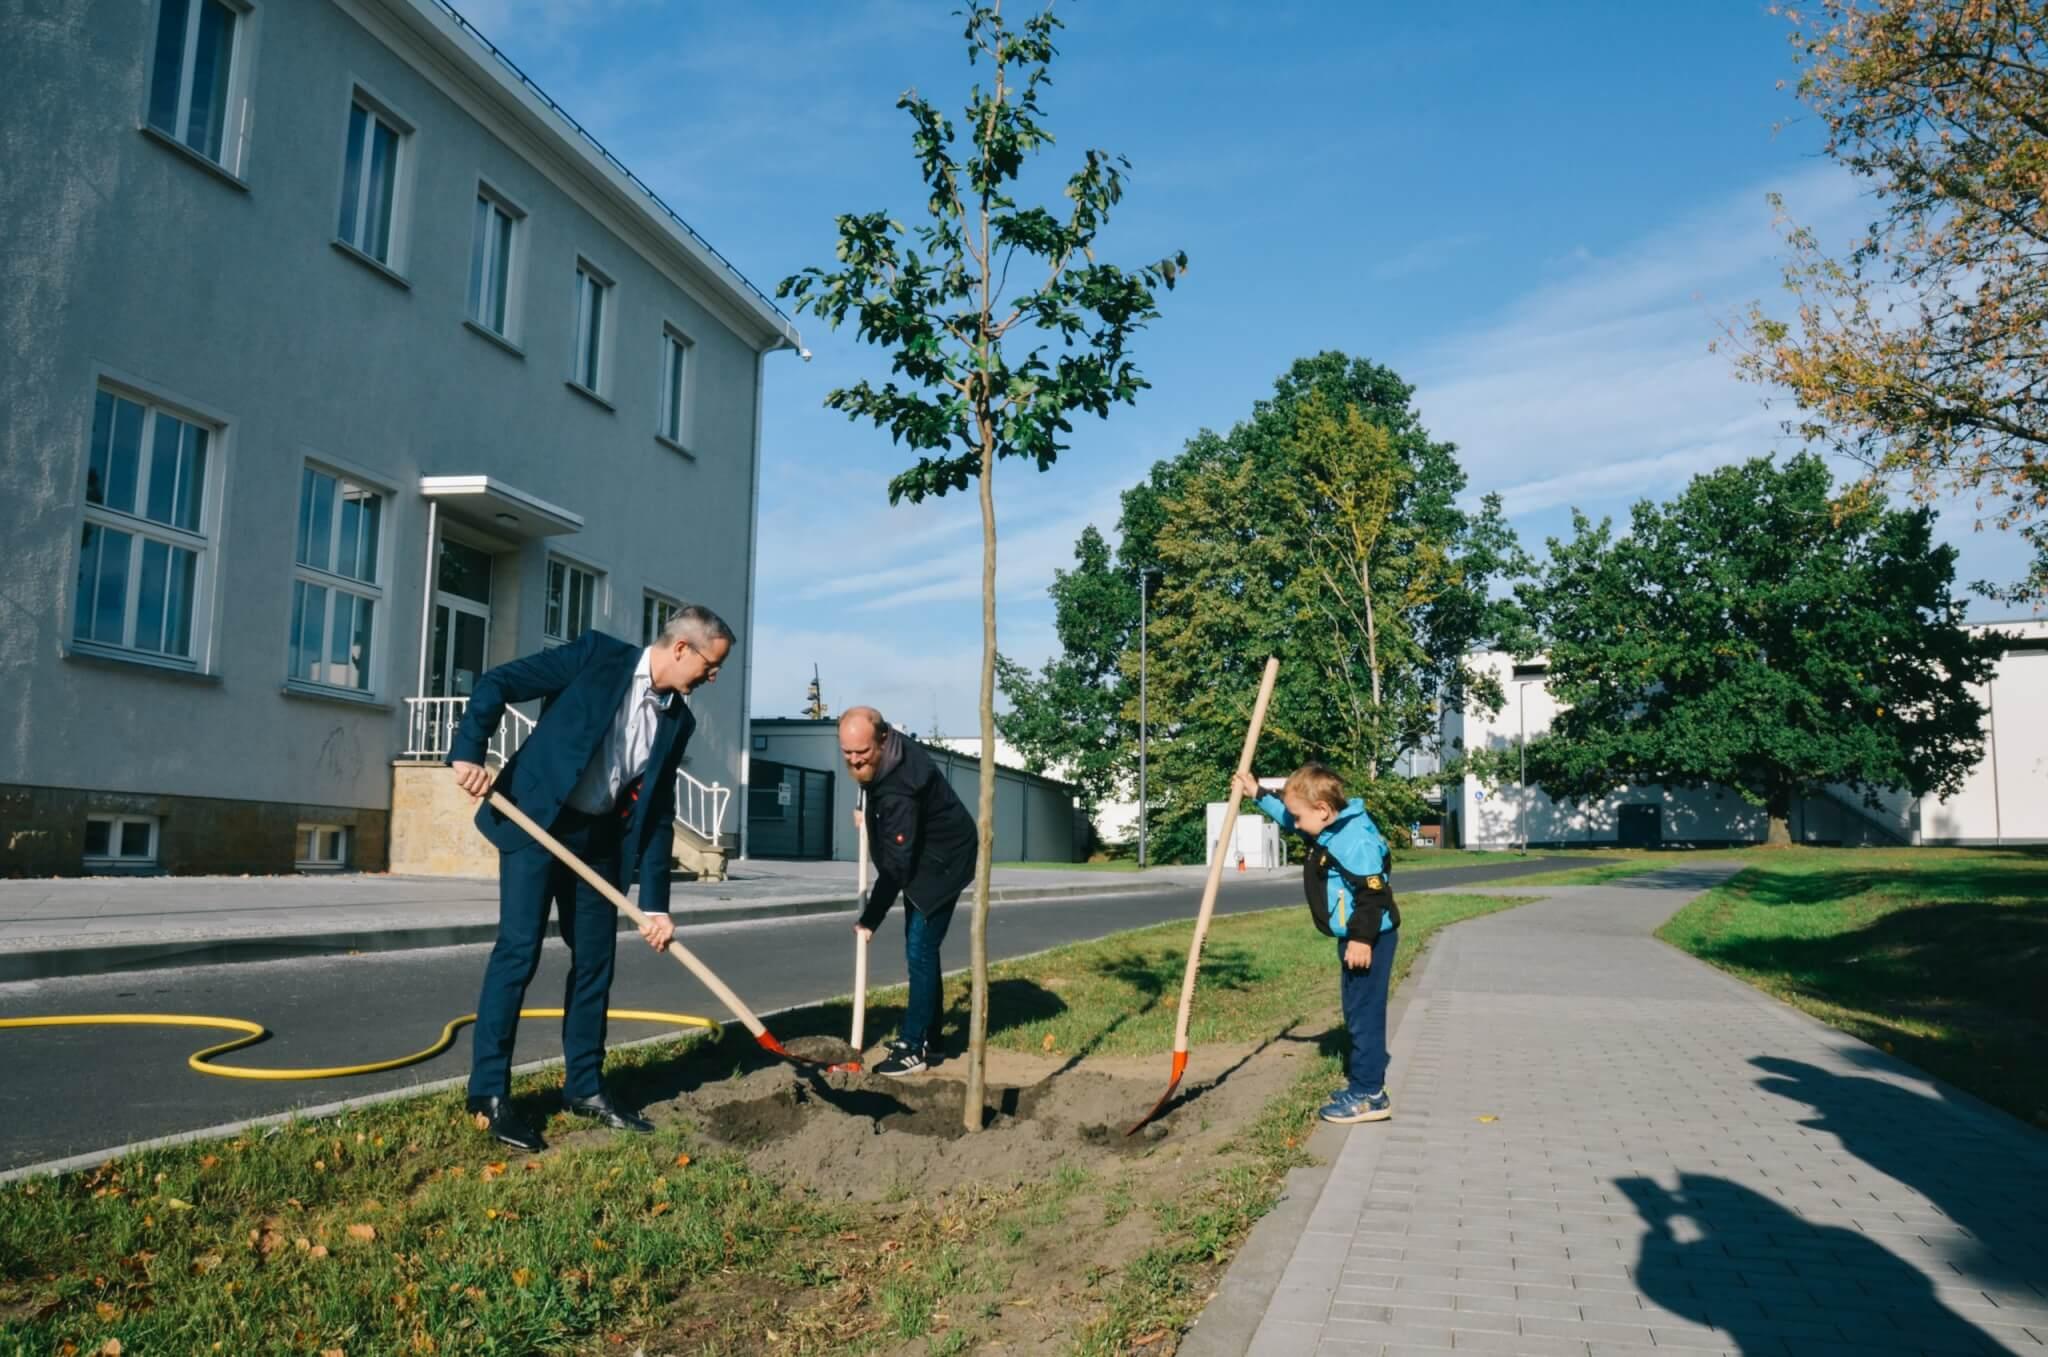 EInheitsbuddeln-0987